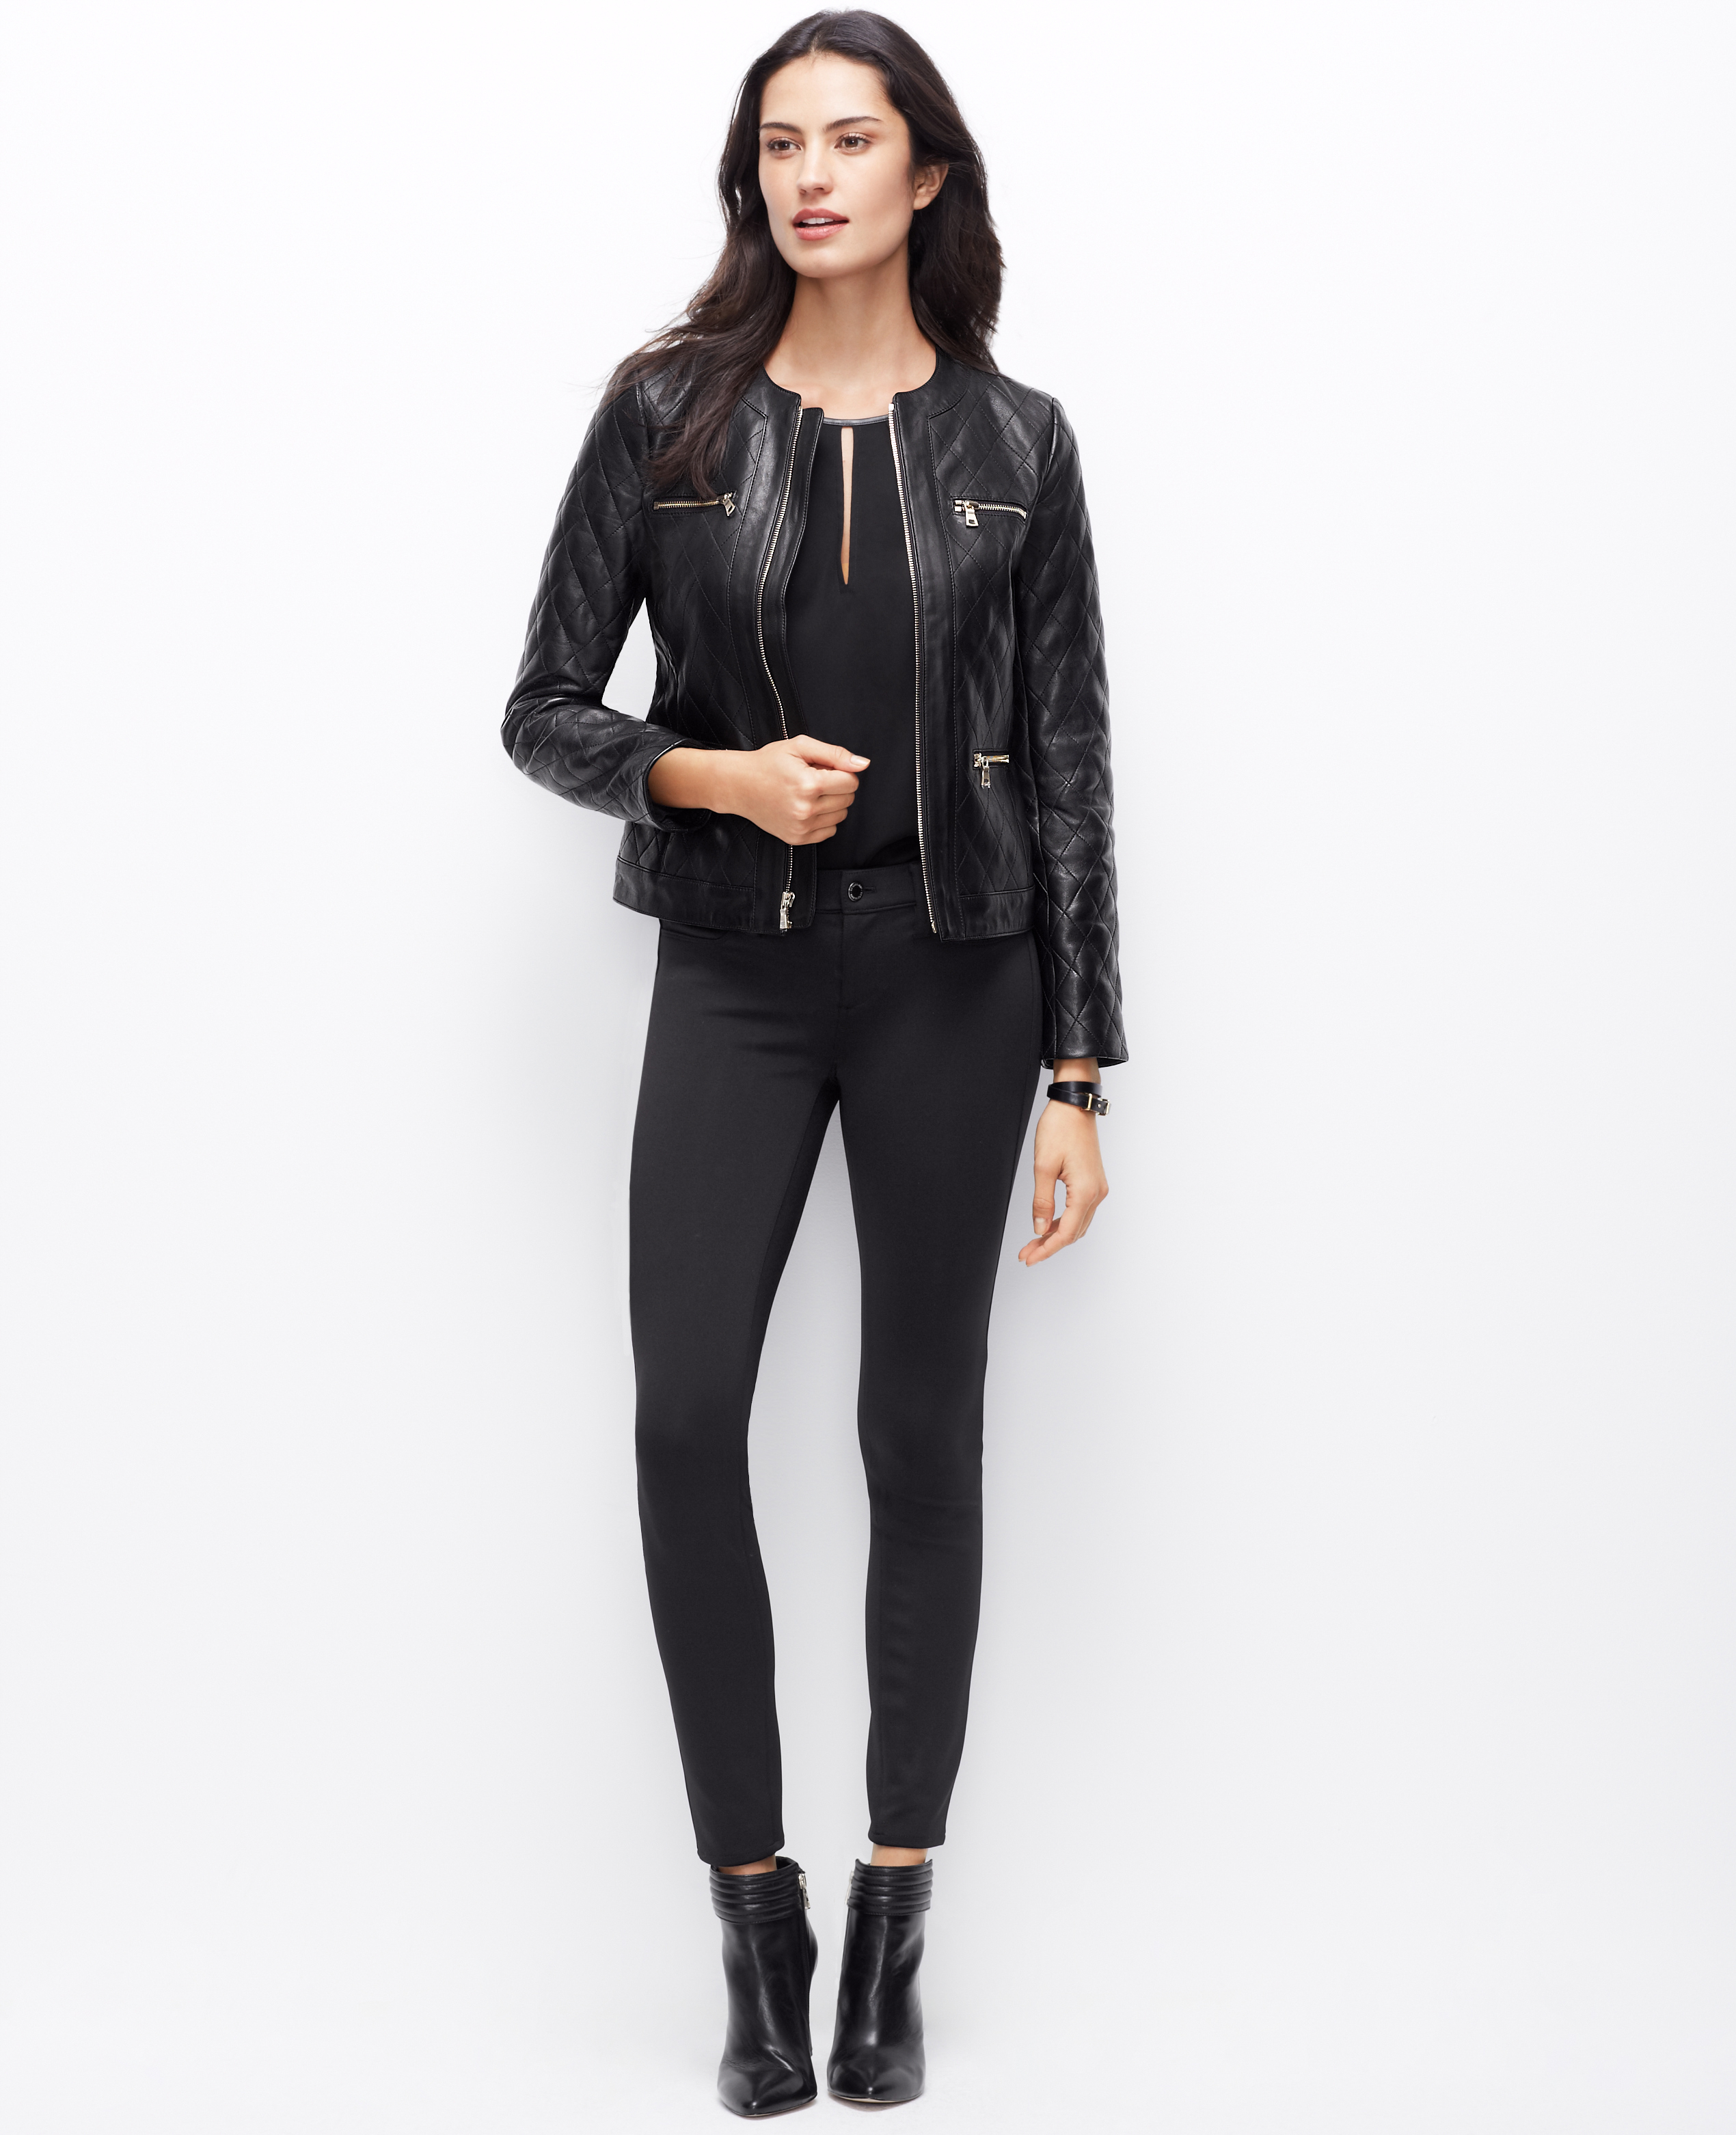 Petite womens leather jackets